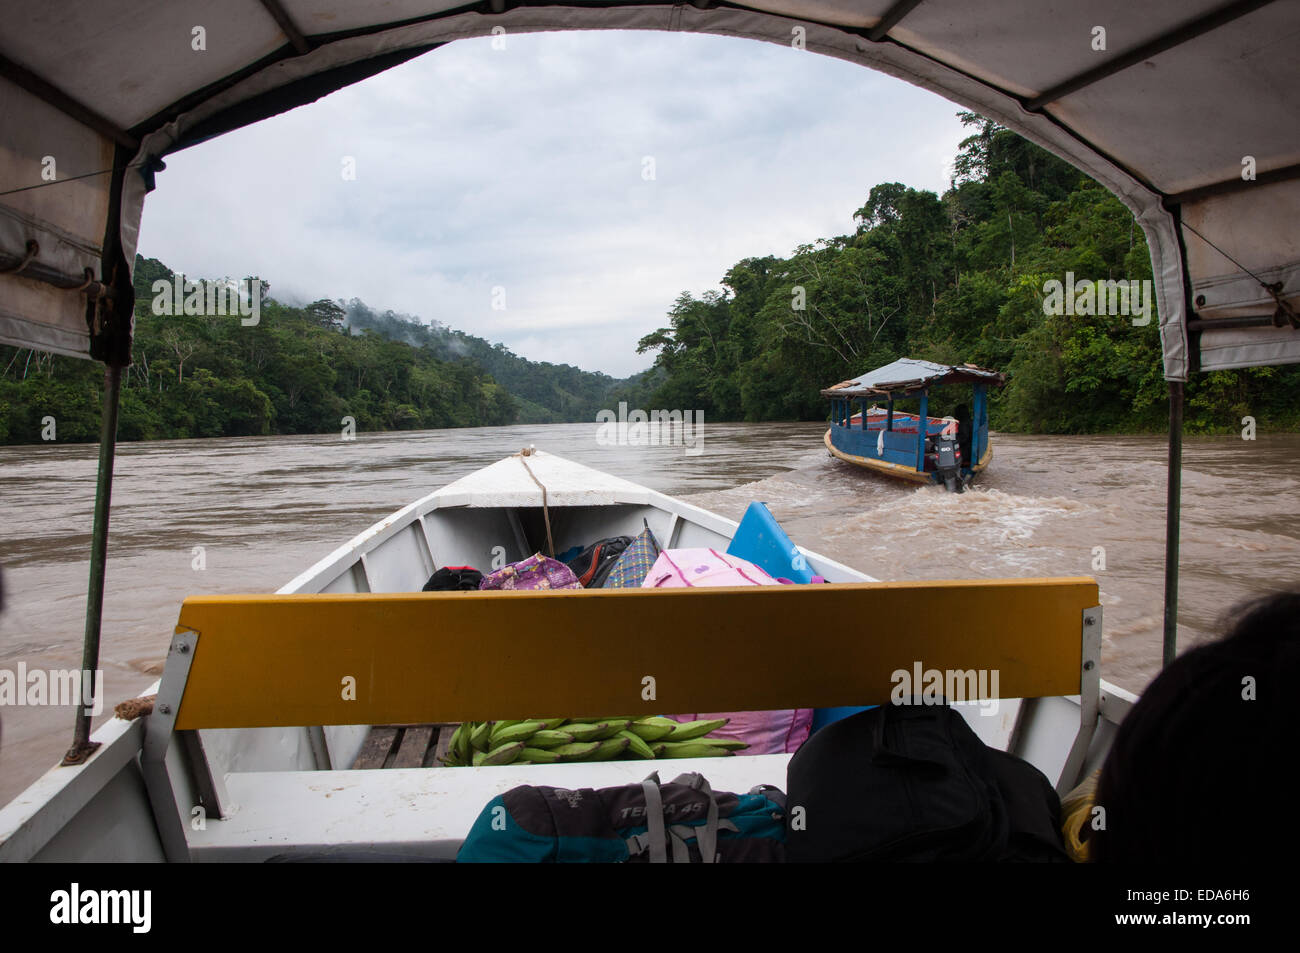 Travel by Chalupa boat through Amazonian River of Peru in Rainy Season - Stock Image